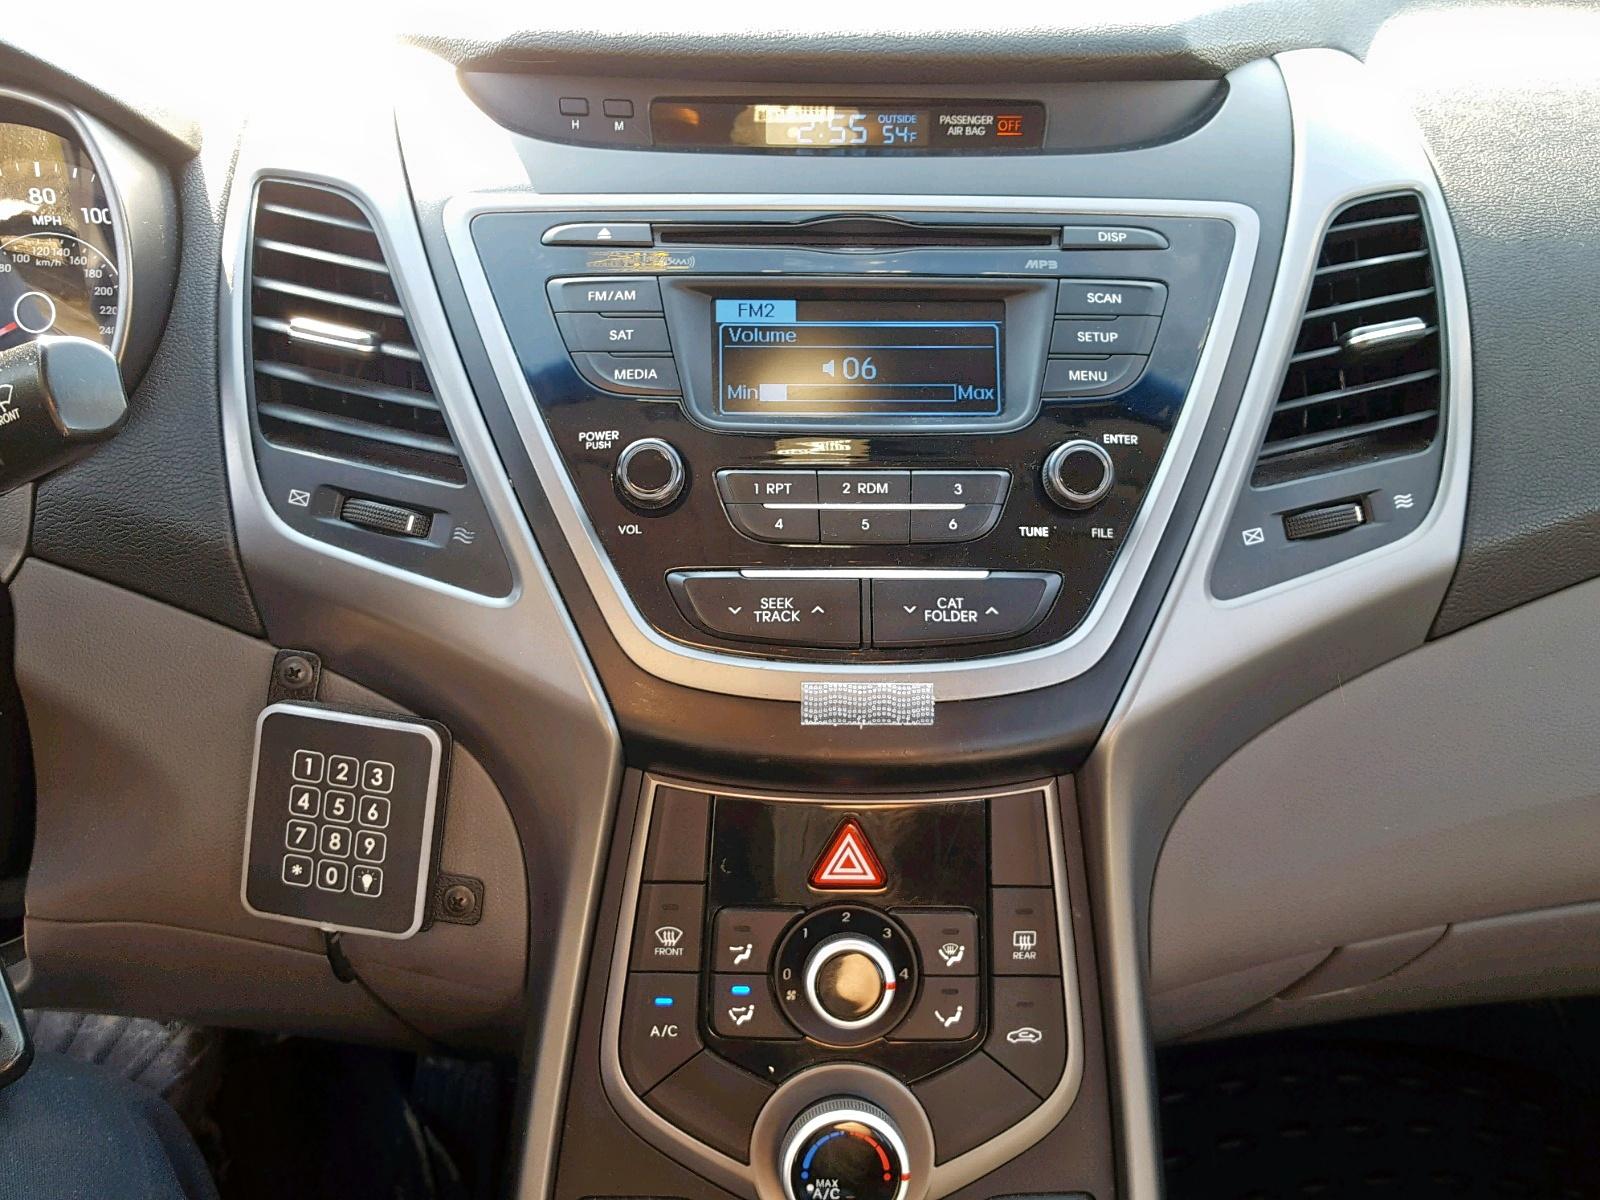 2016 Hyundai Elantra Se 1.8L engine view